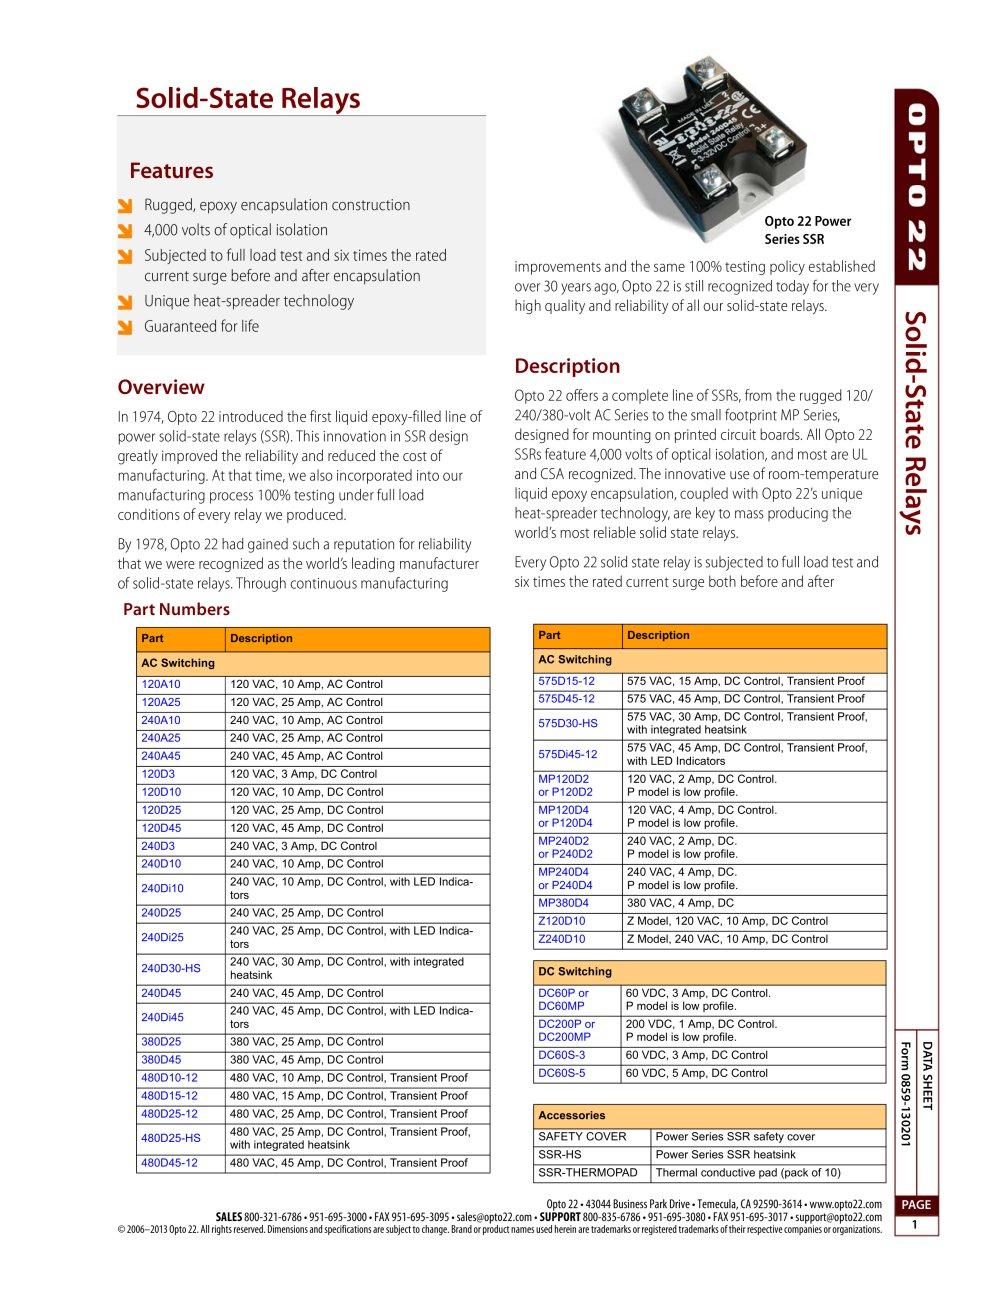 Opto 22 Ssr Wiring Diagram | Wiring Liry Opto Relay Wiring Diagram on